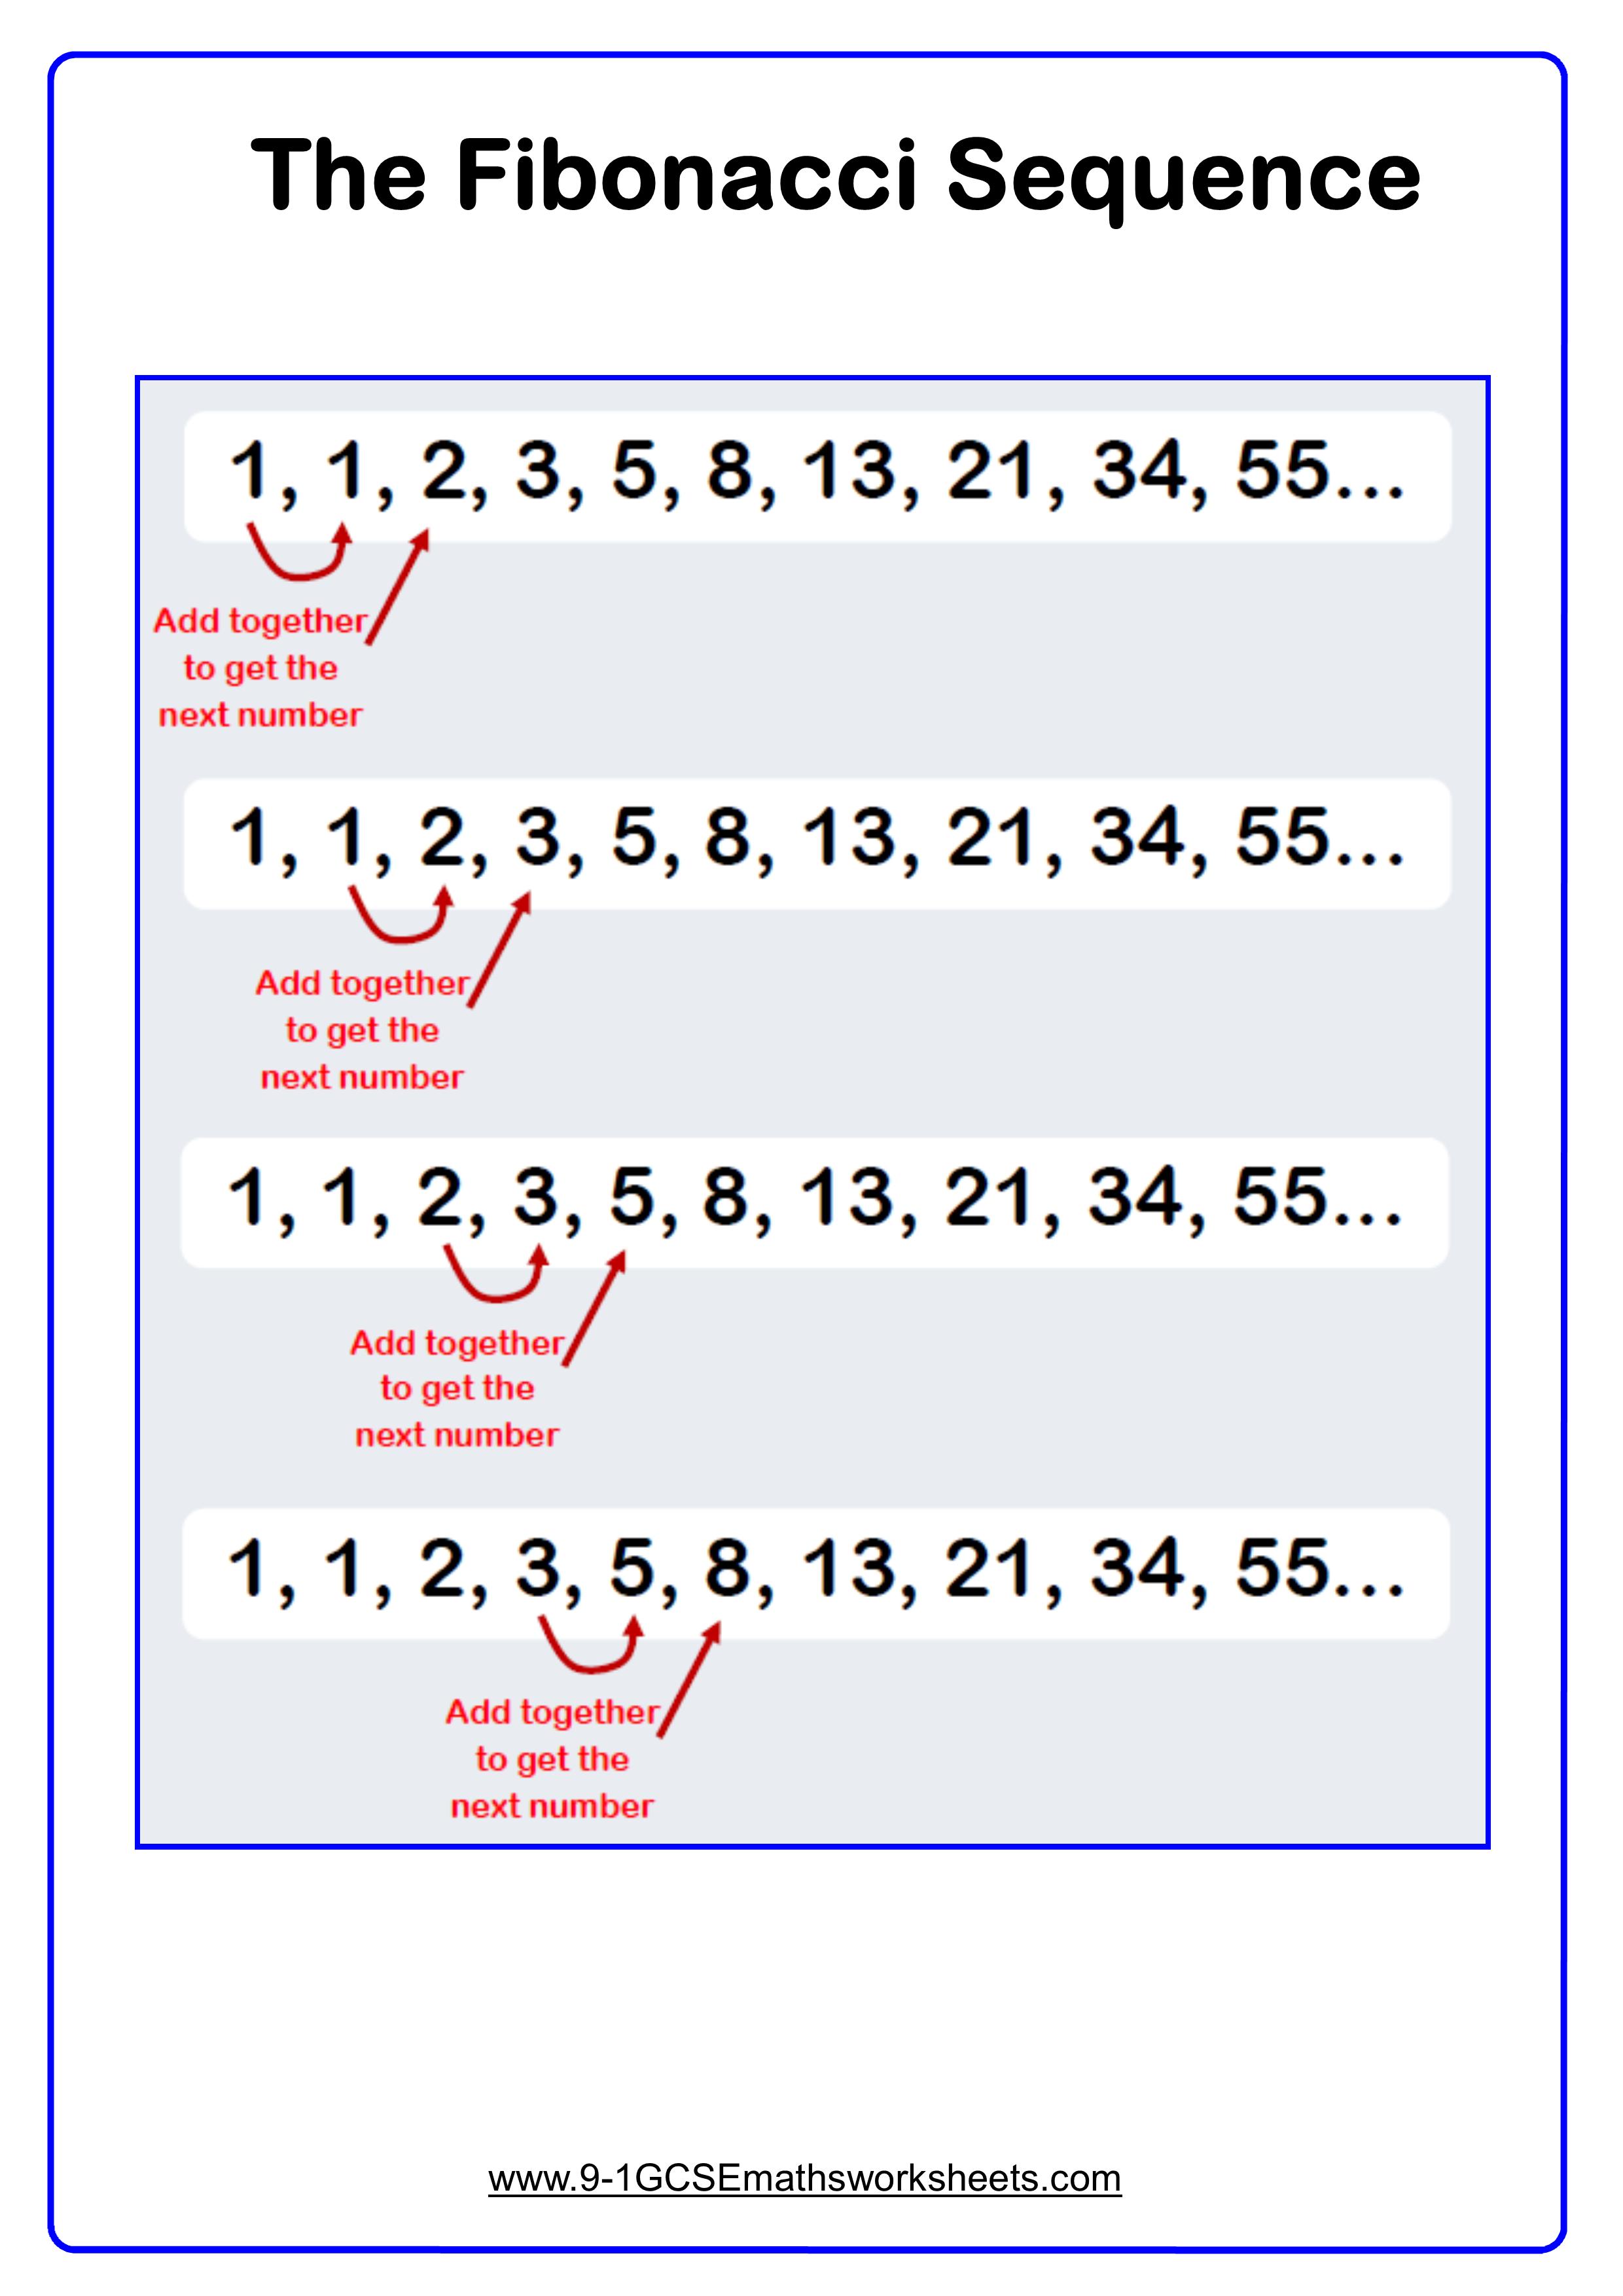 Fibonacci Sequence Example